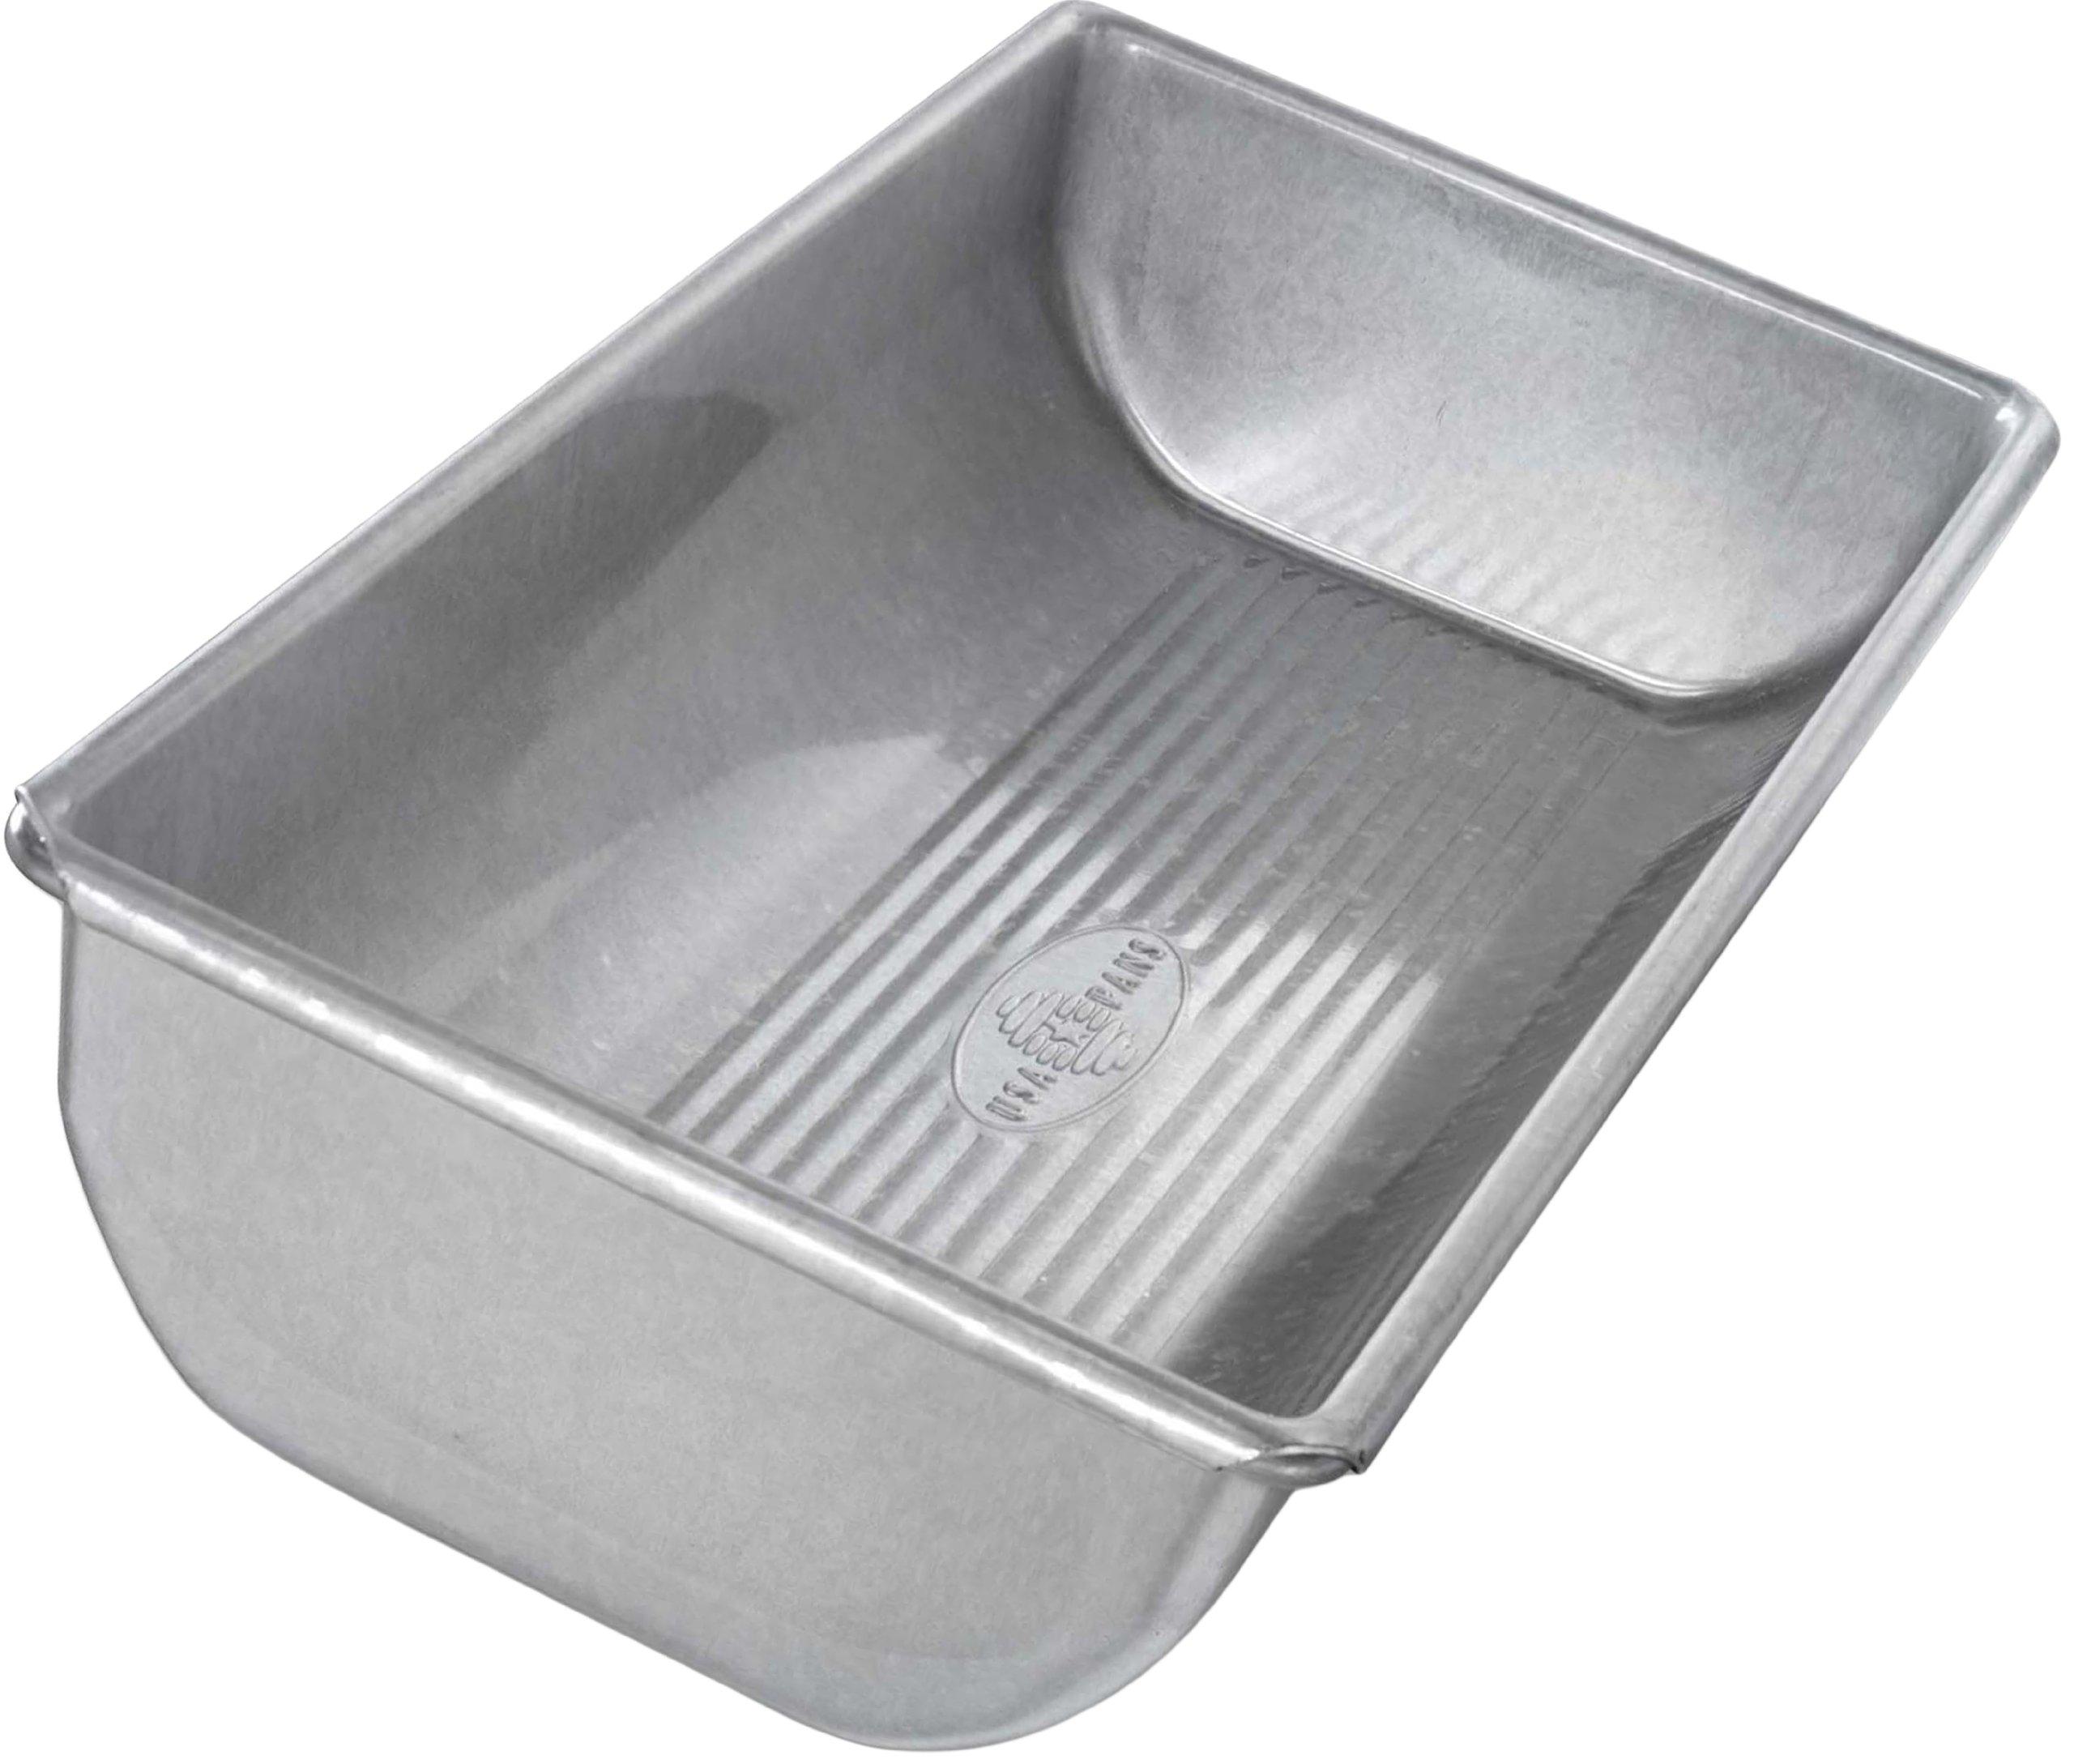 USA Pan Bakeware Aluminized Steel Hearth Bread Pan by USA Pan